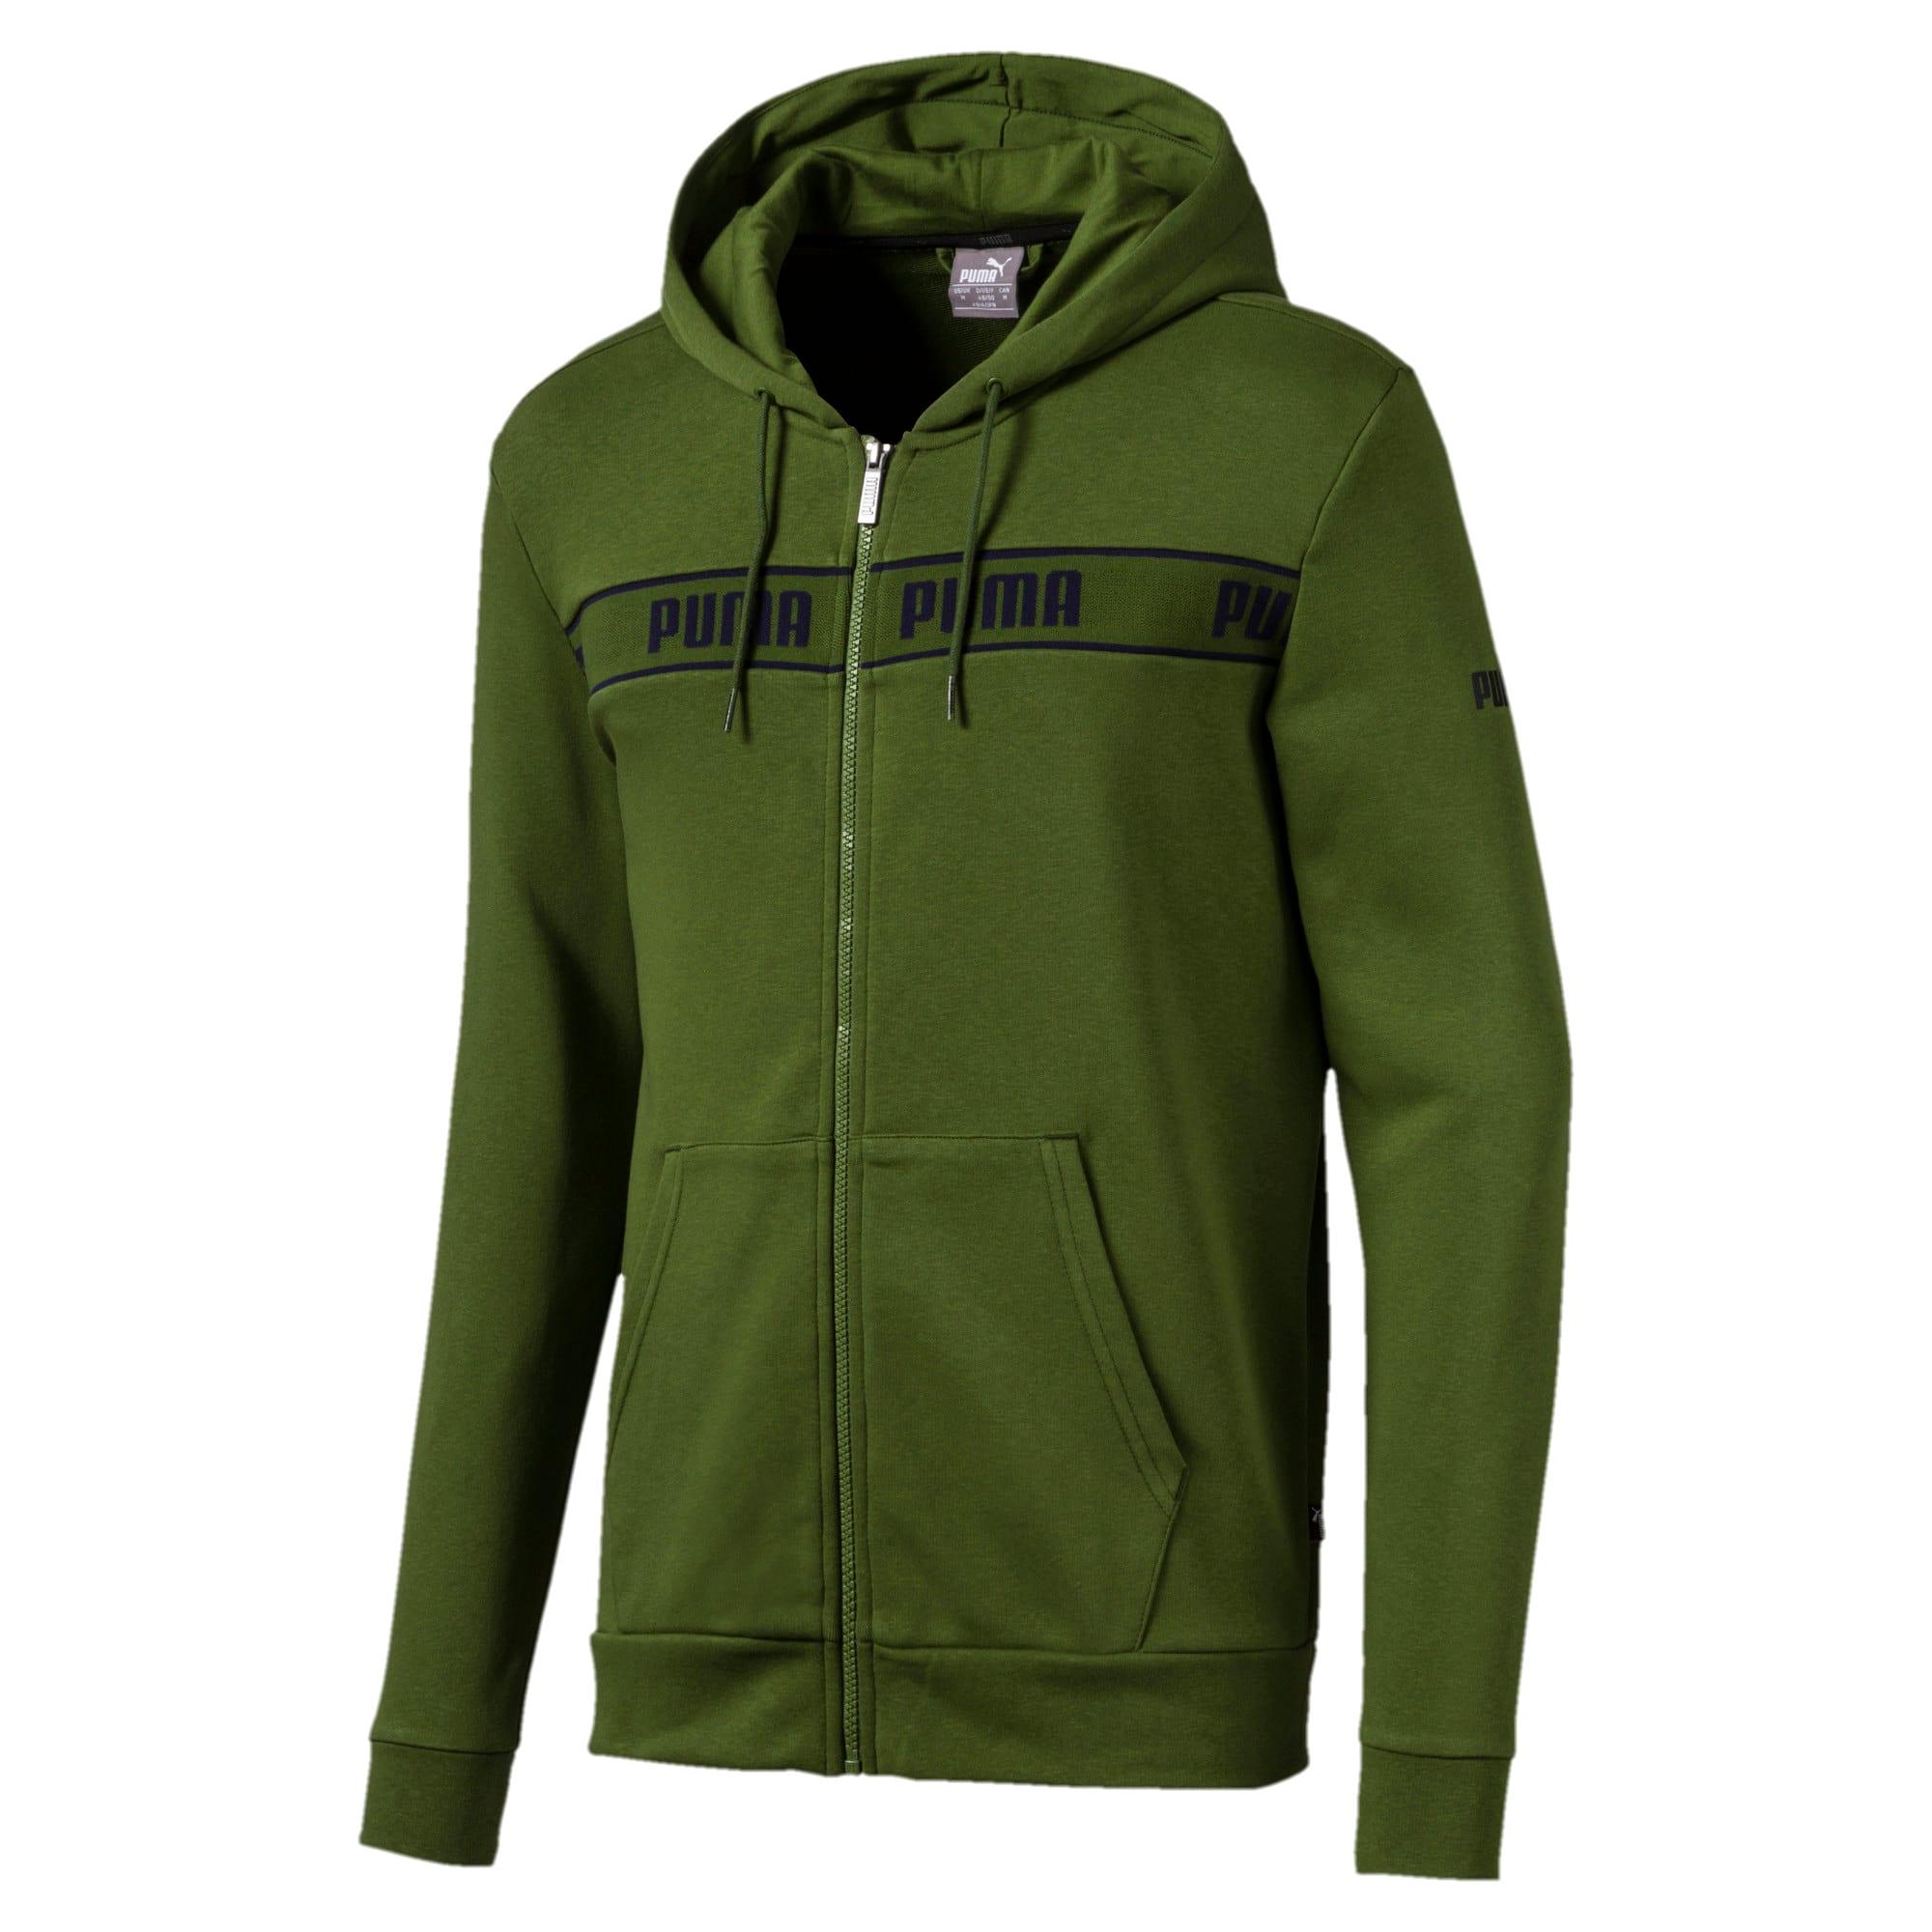 Miniatura 1 de Chaqueta con capucha Amplified para hombre, Garden Green, mediano